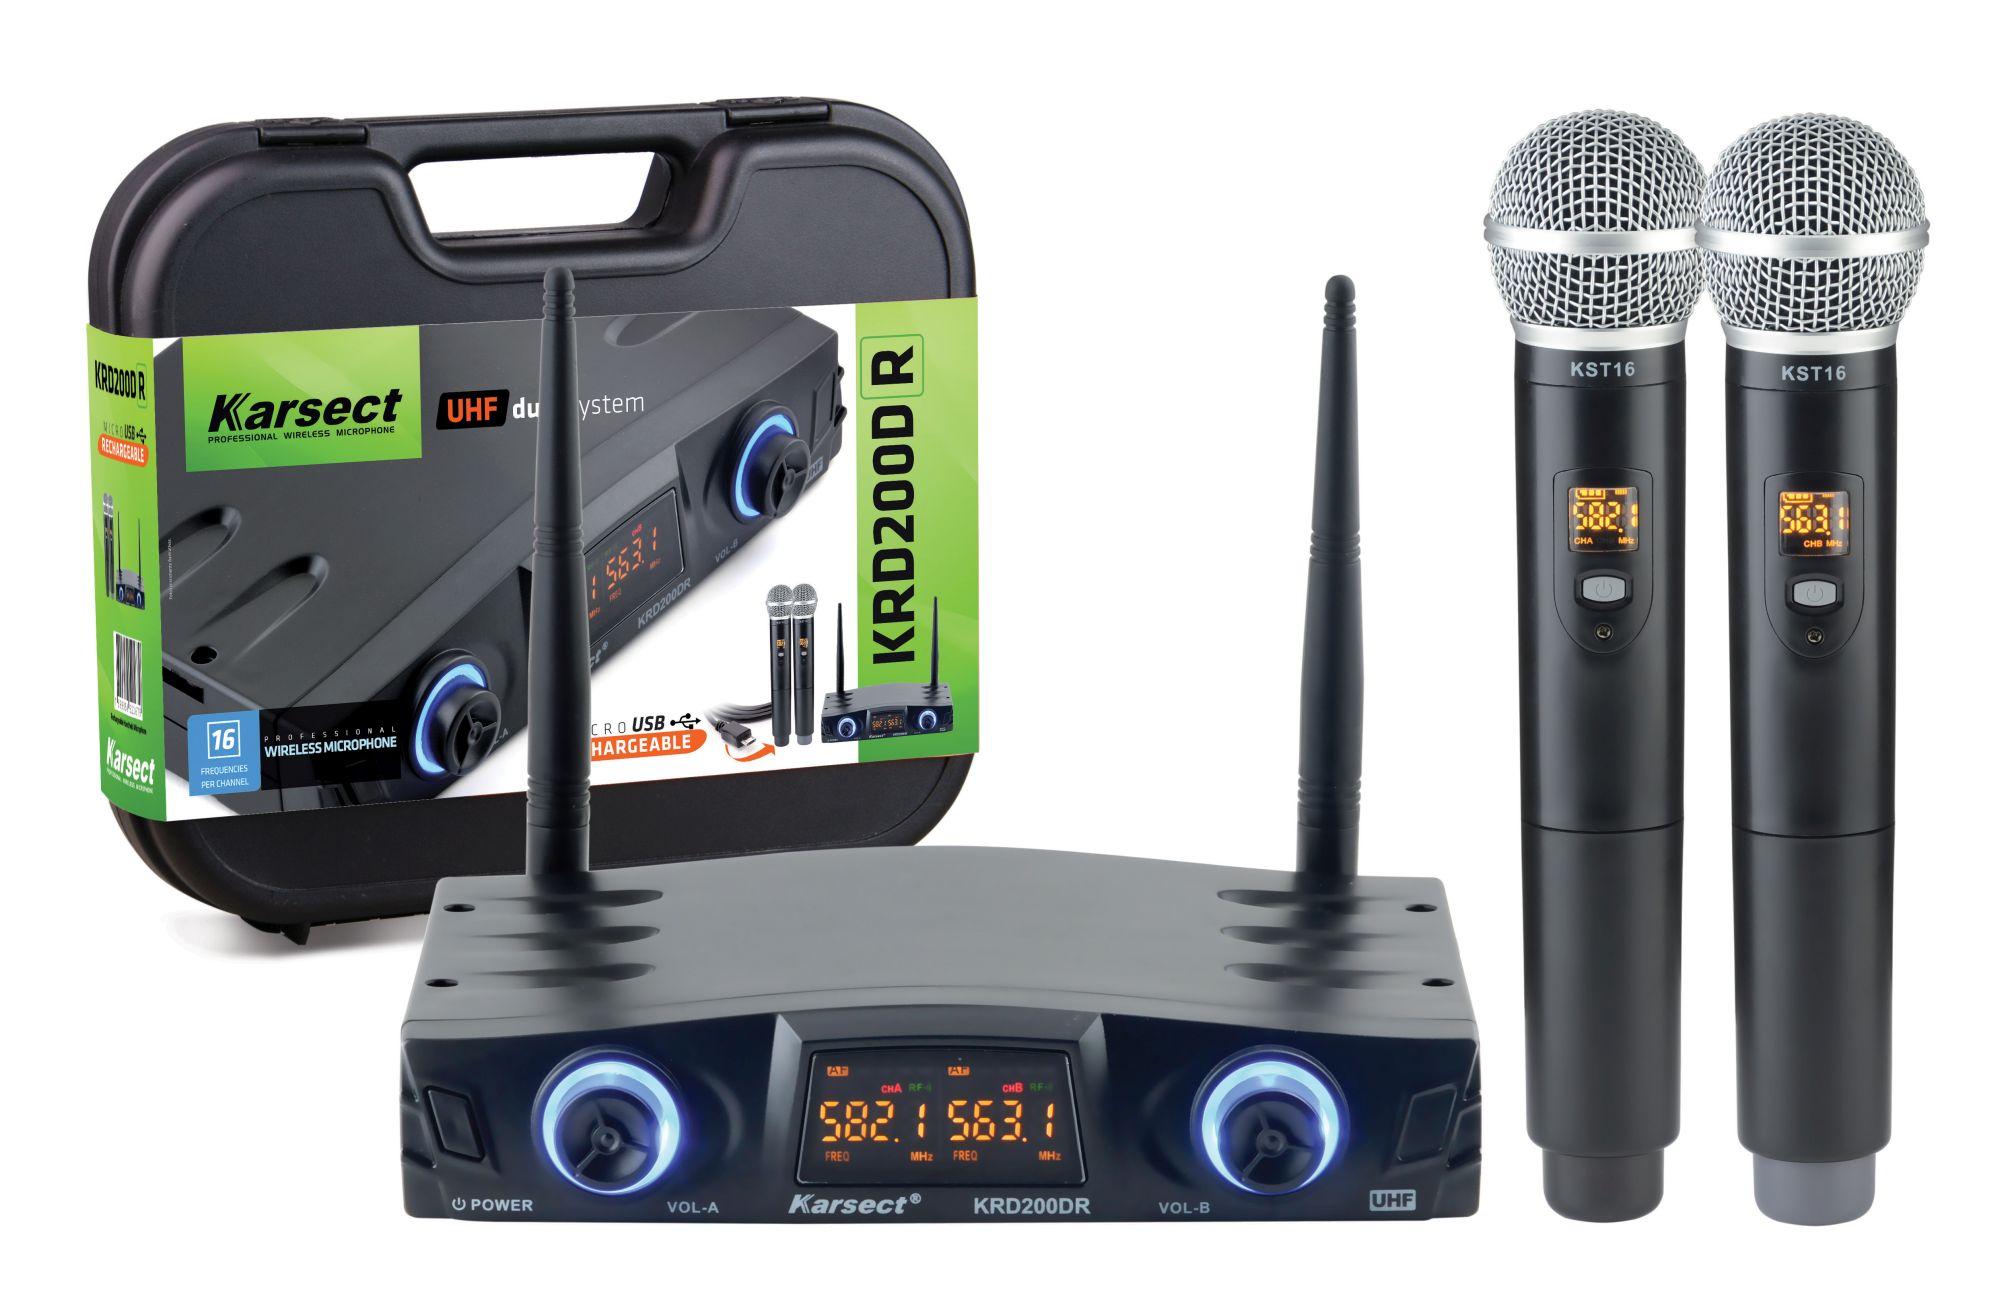 Microfone S/fio Karsect Krd200dr Duplo Mao Recarregavel